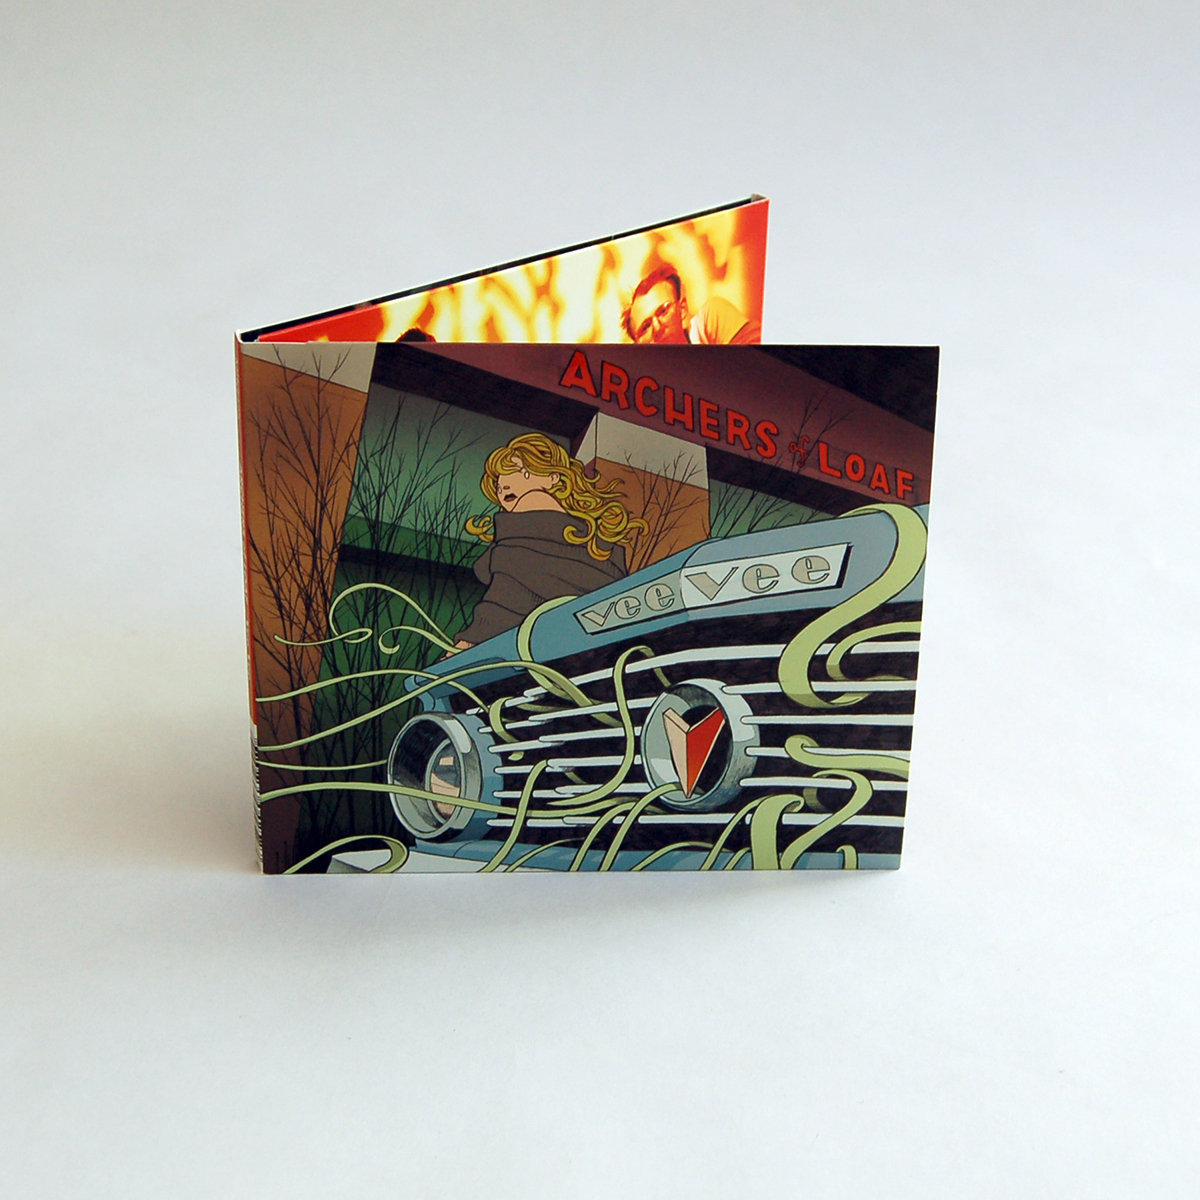 Big Joe and) Phantom 309 [Out of Print Red Sovine Cover